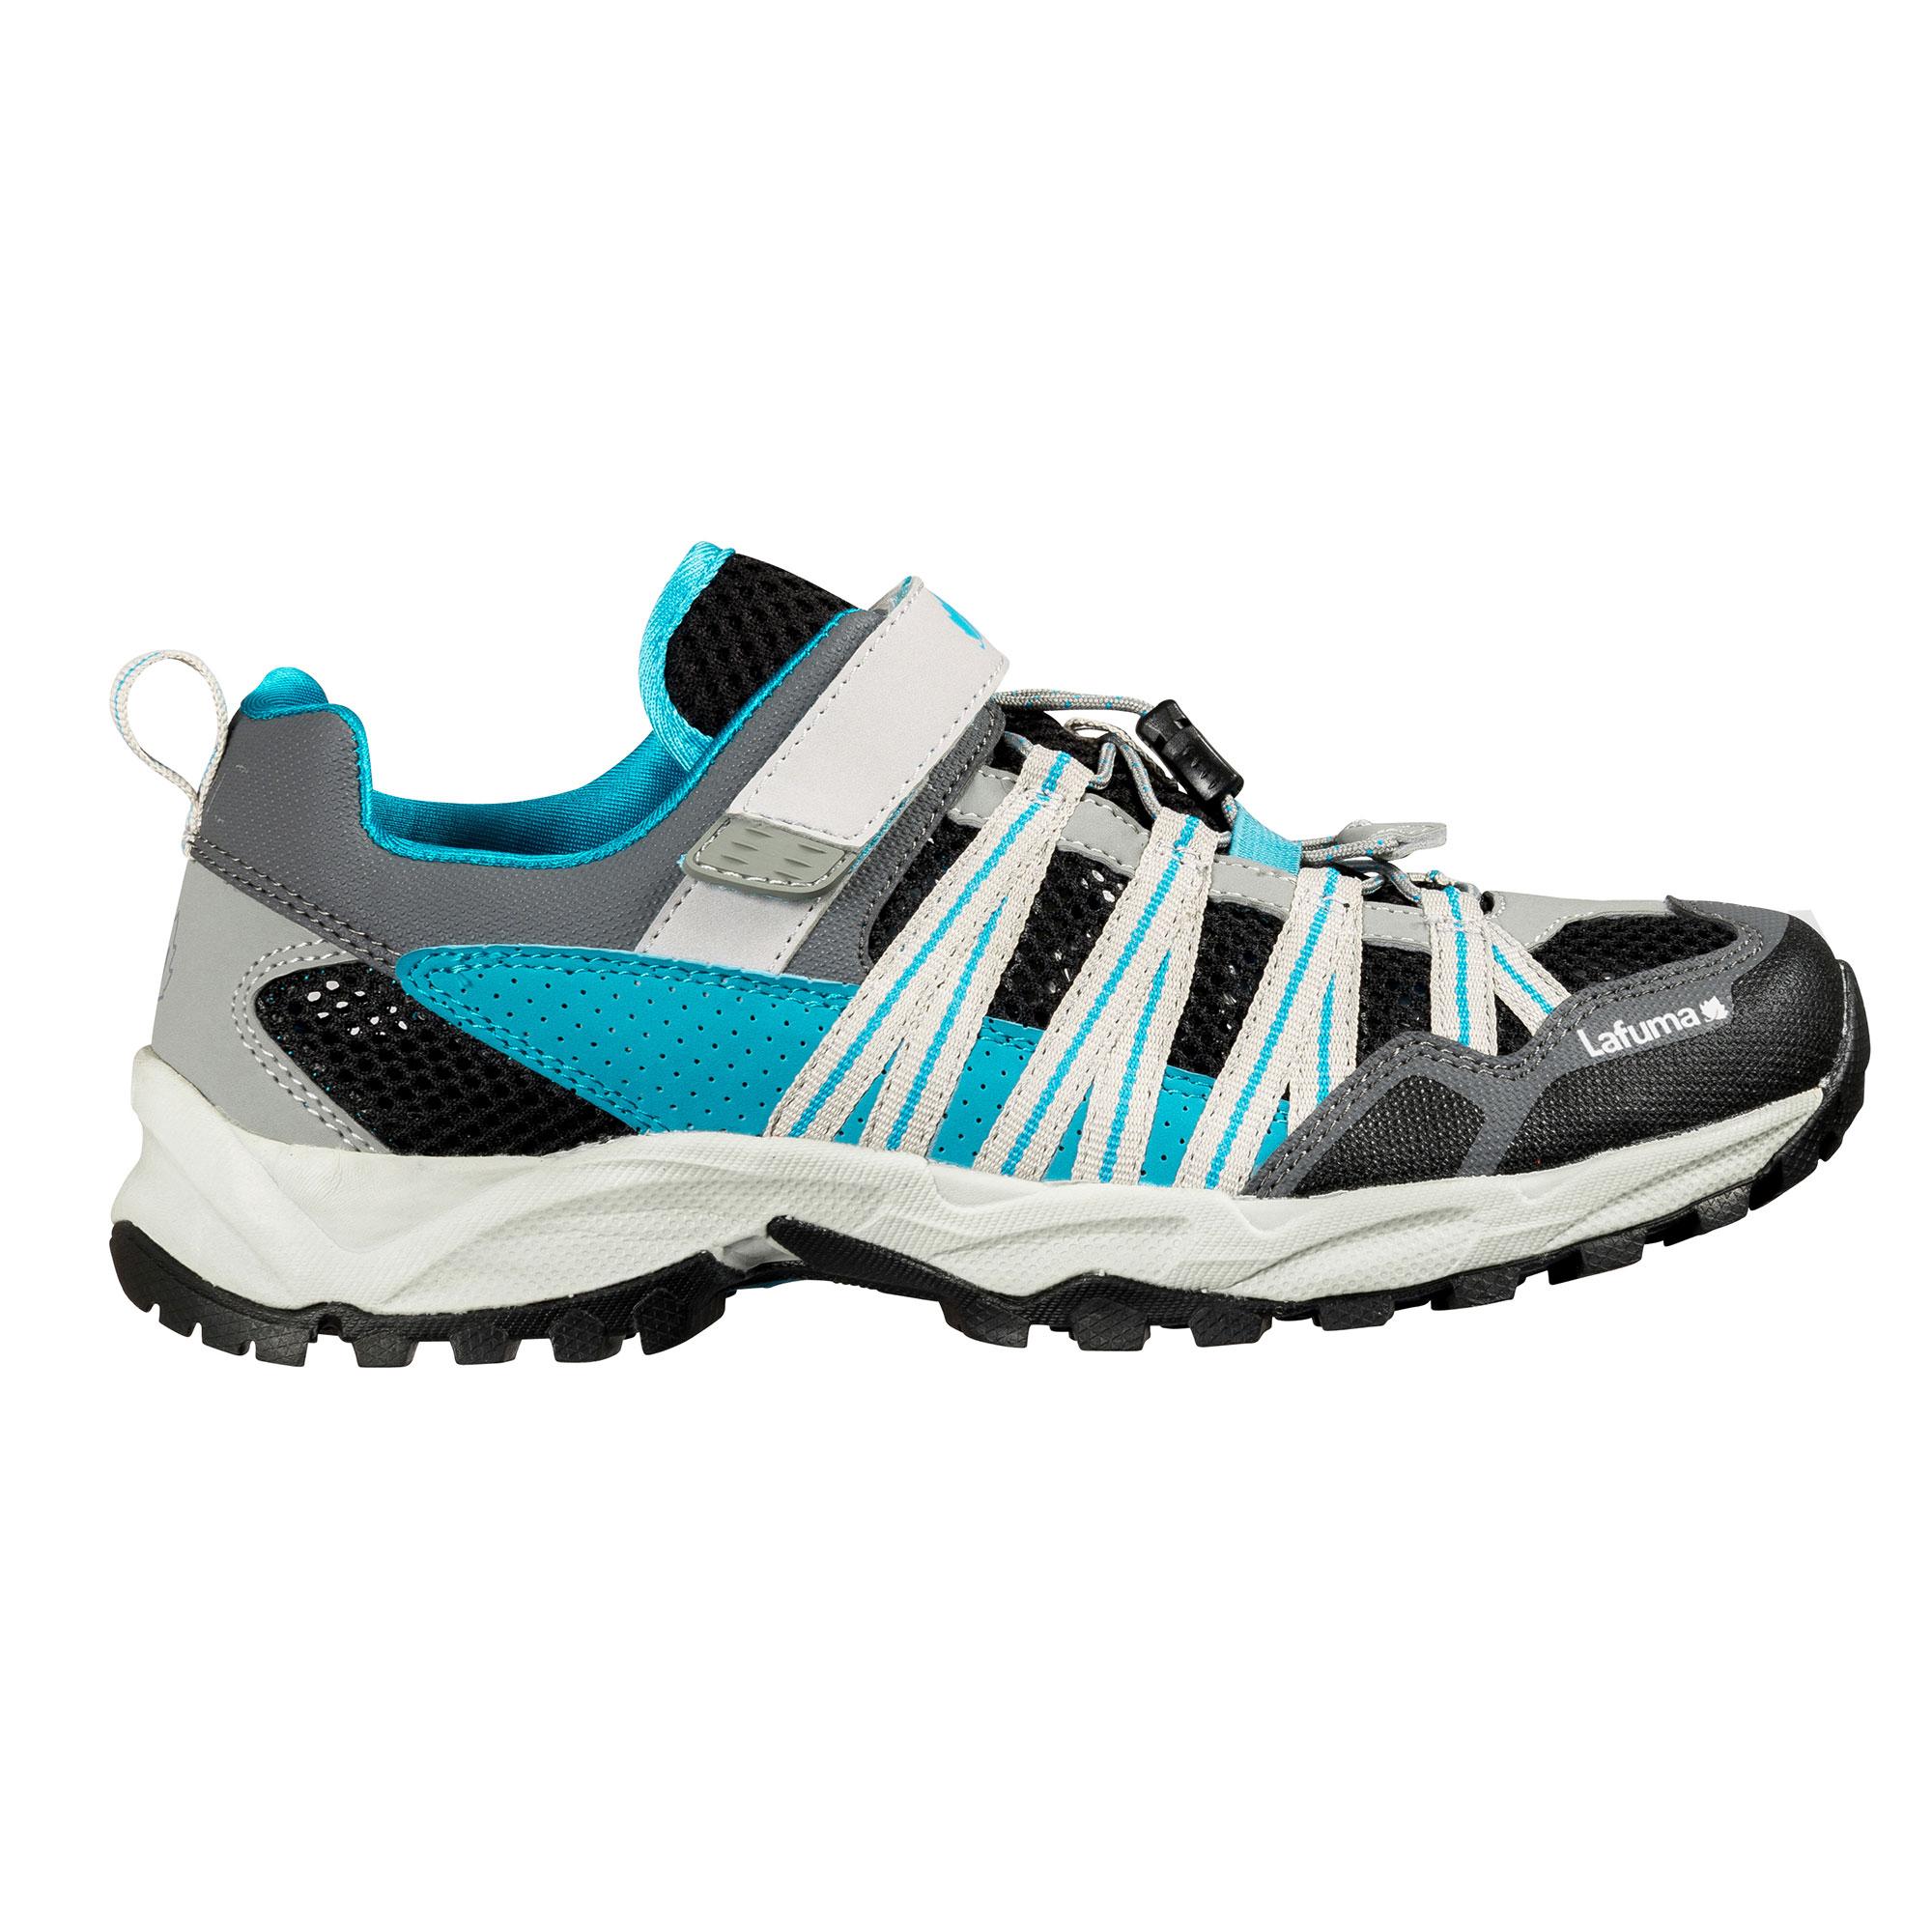 Lafuma Guarani W - Walking sandals - Women's